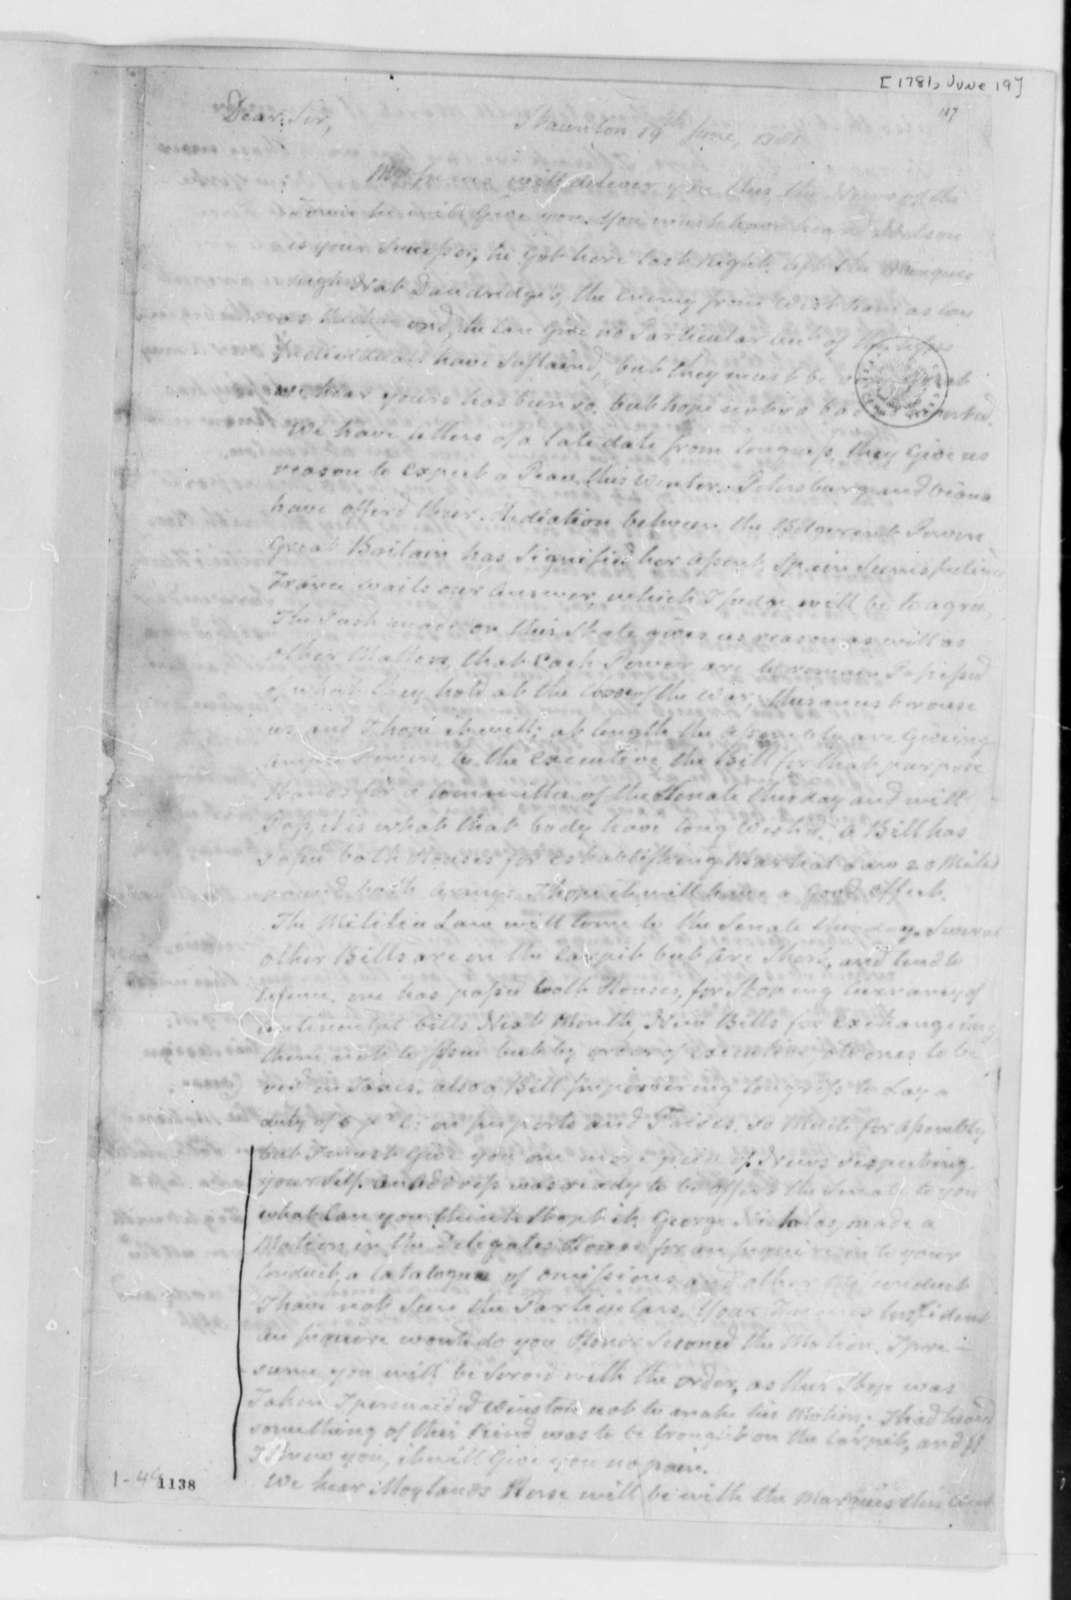 Archibald Cary to Thomas Jefferson, June 19, 1781